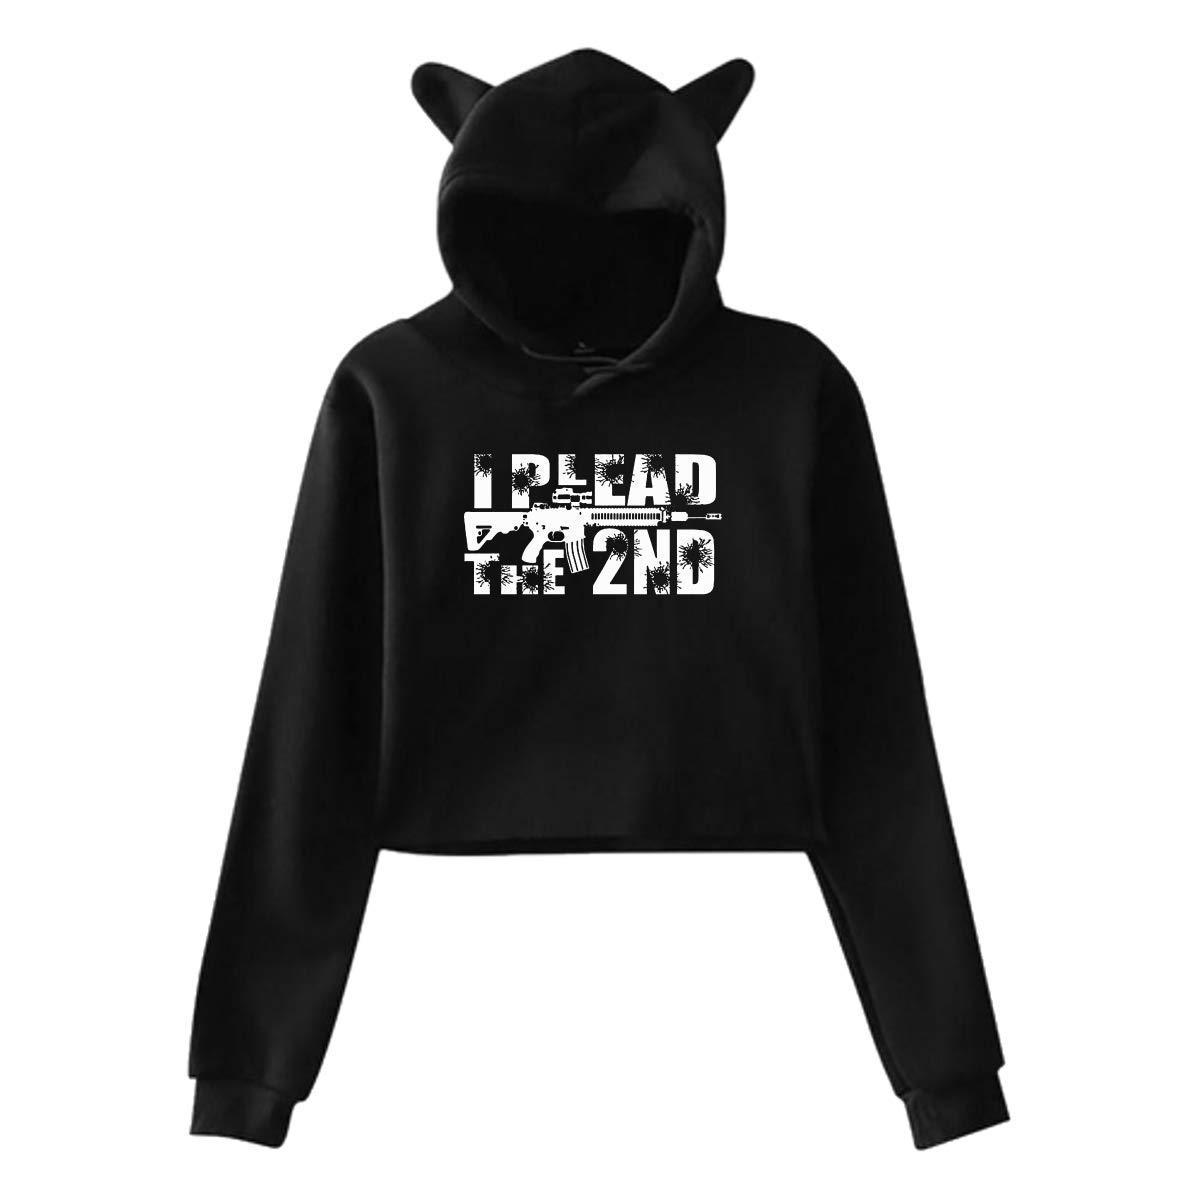 I Plead The 2nd,Cat Ear Hoodie Sweatshirts,Midriff-Baring Hoody Sweater Womens Sexy Stylish Hoodie Sweater Girls Cute Hoodies